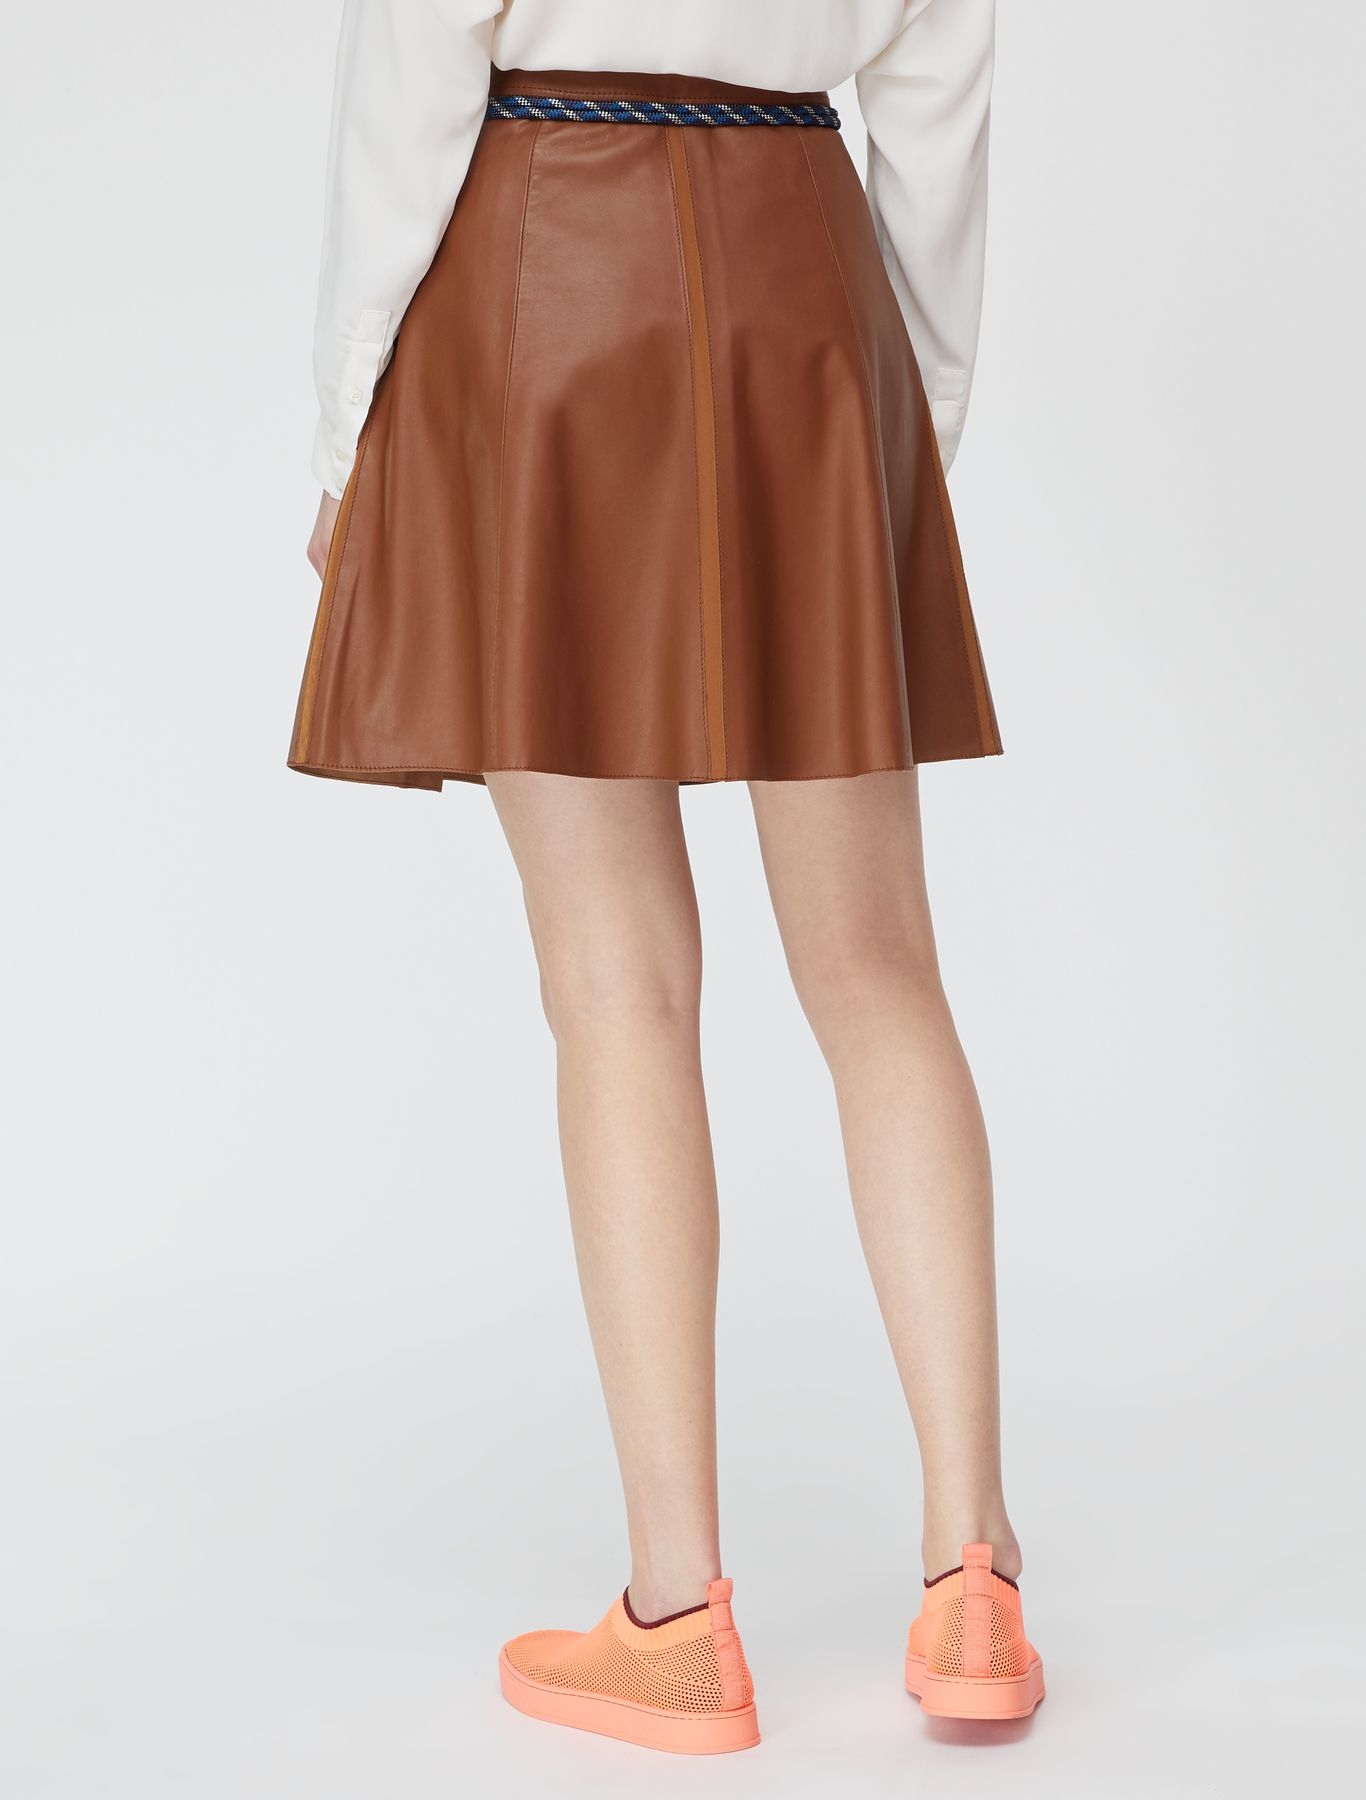 DELEGATO Leather Skirt brown 2